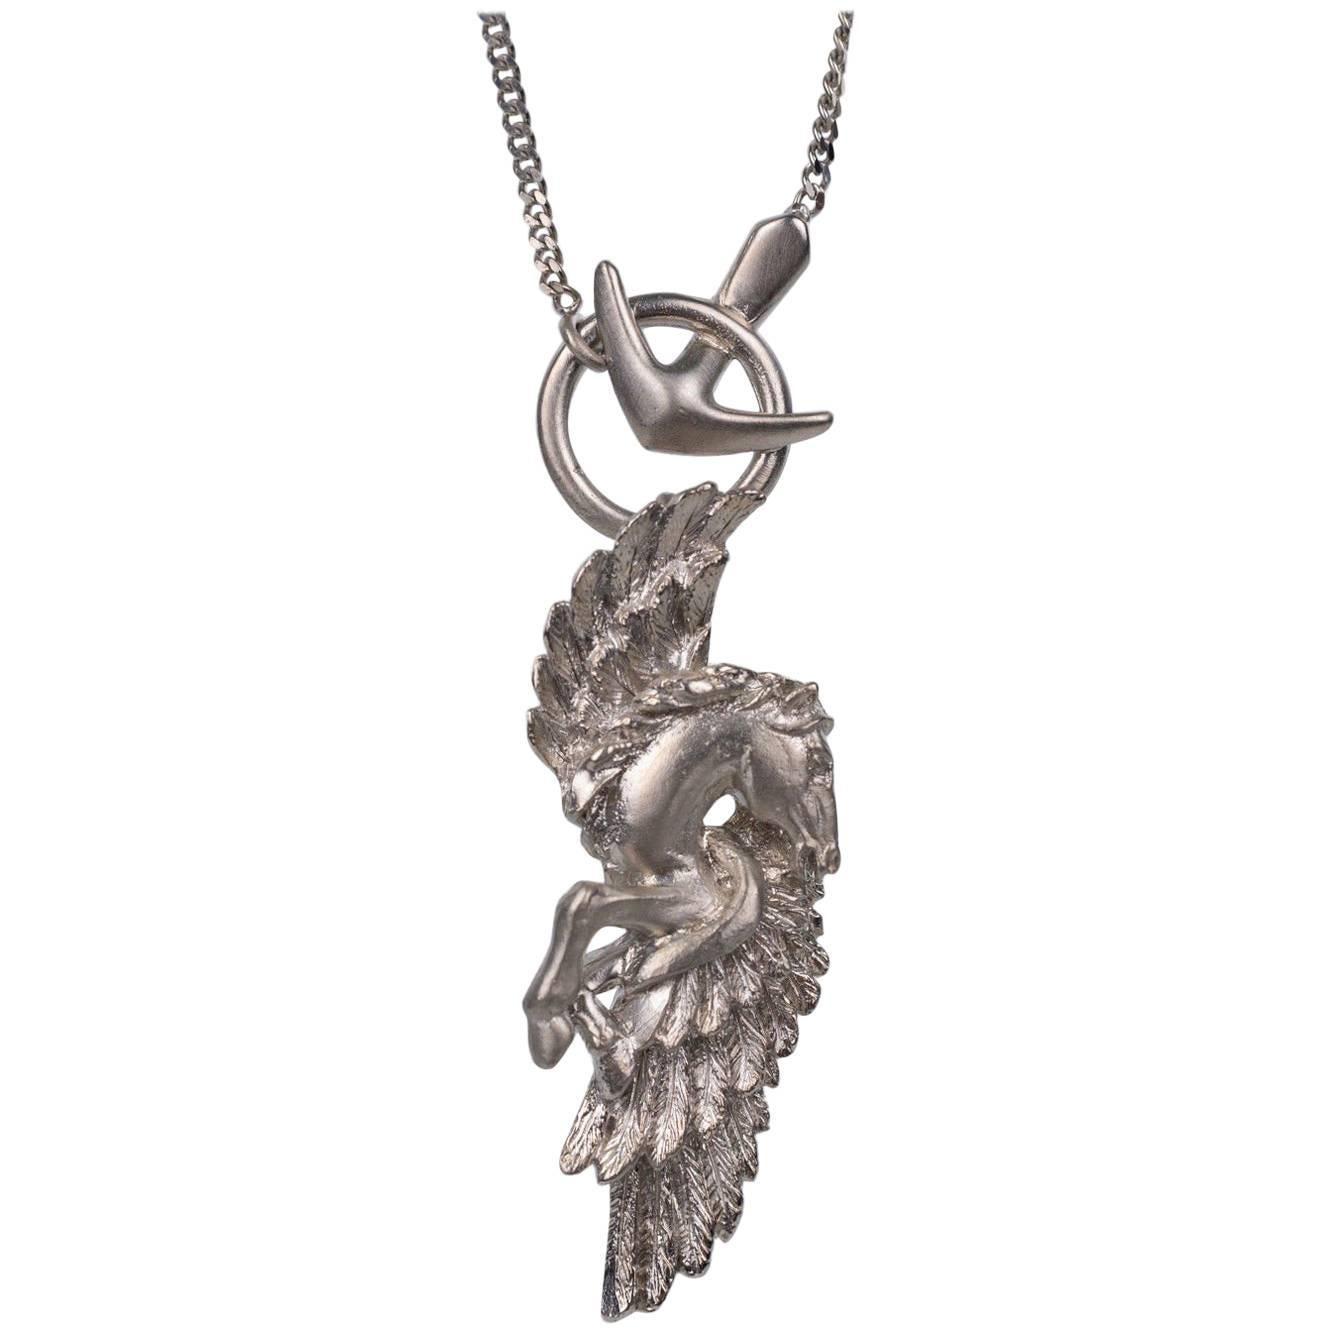 1stdibs Roberto Cavalli Silver Metal Serpent Pendant Chain Necklace 7LyH8